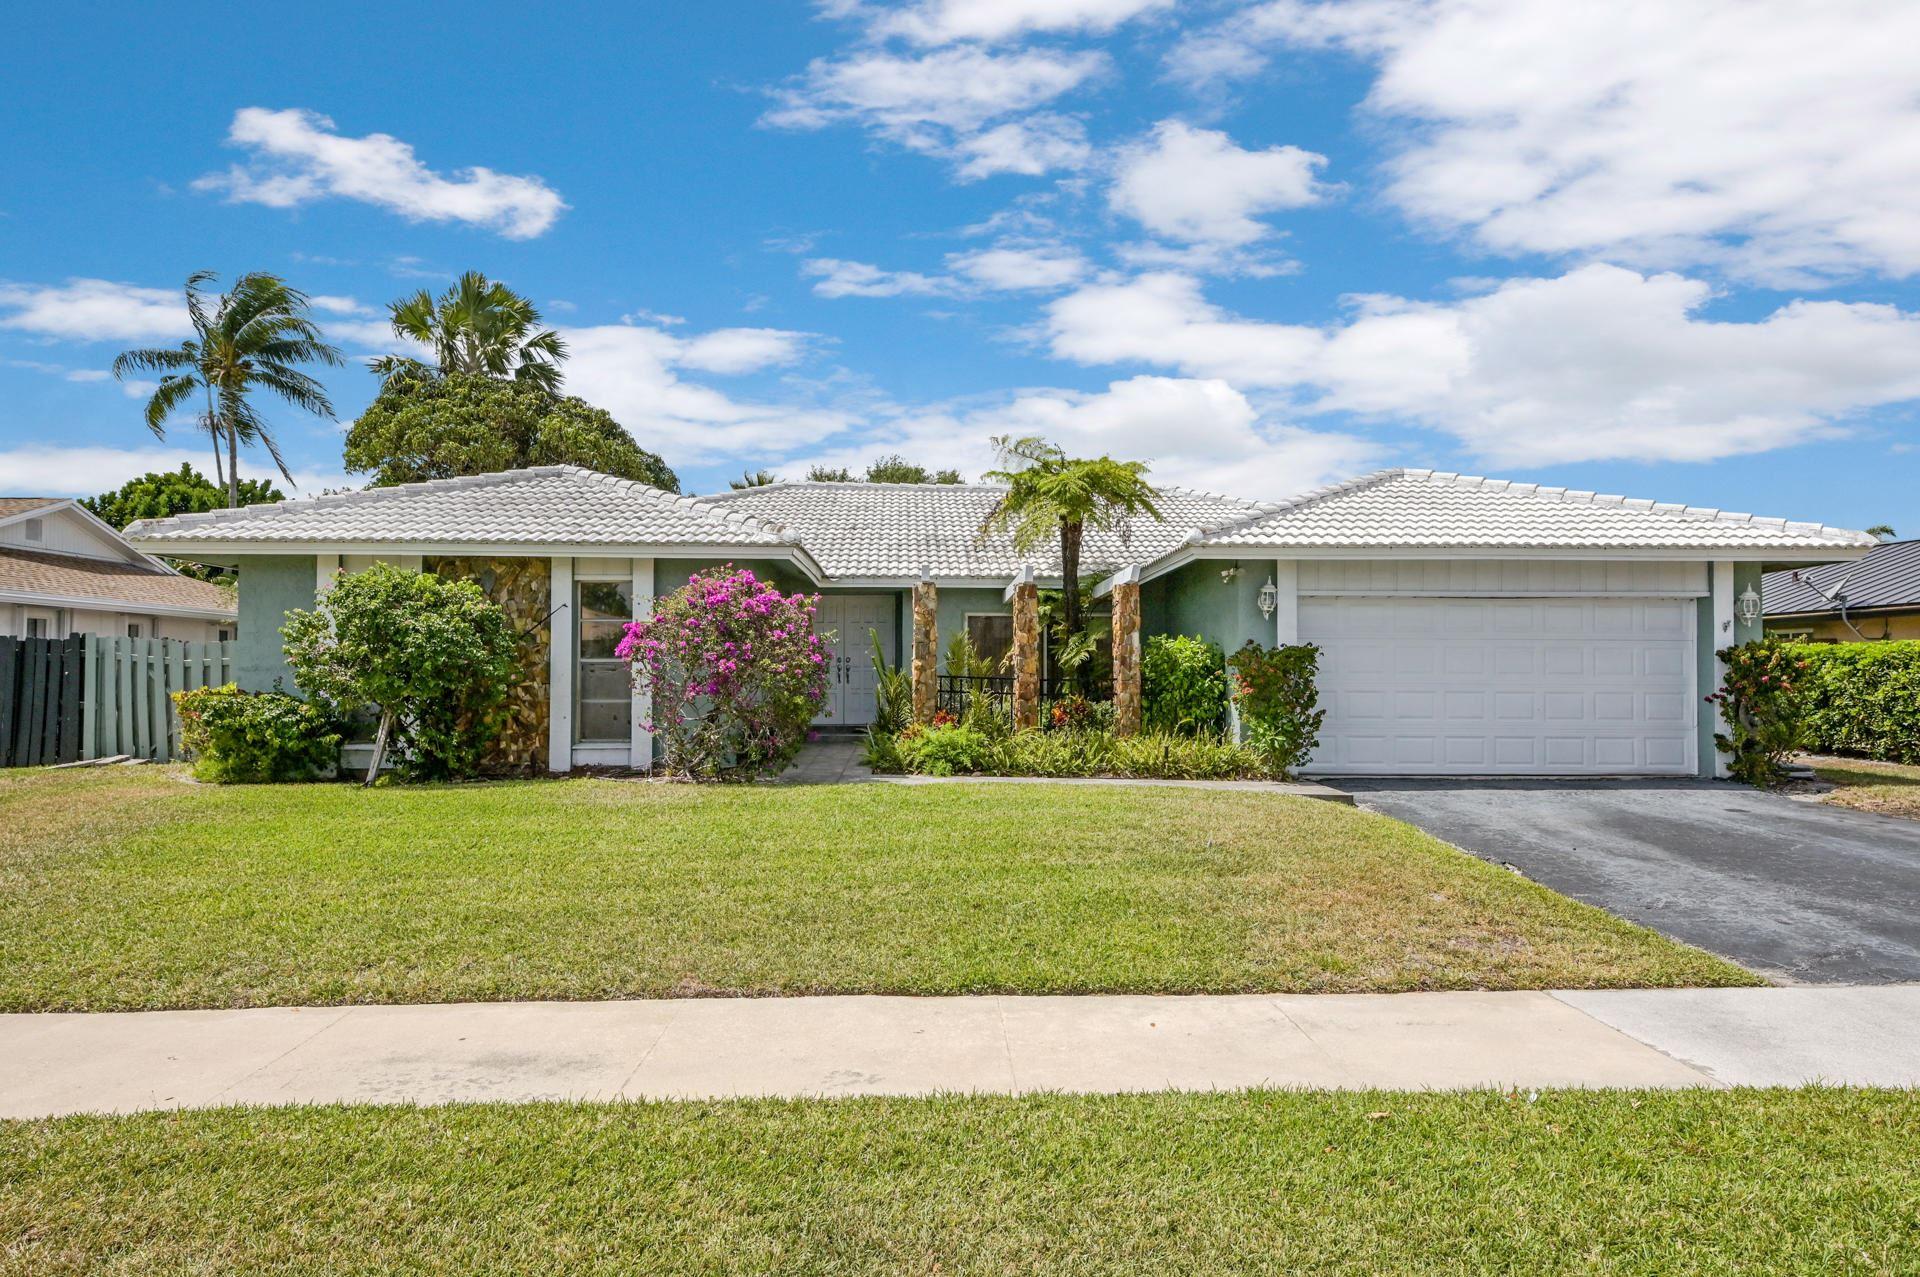 17727 Raintree Terrace, Boca Raton, FL 33487 - #: RX-10702972